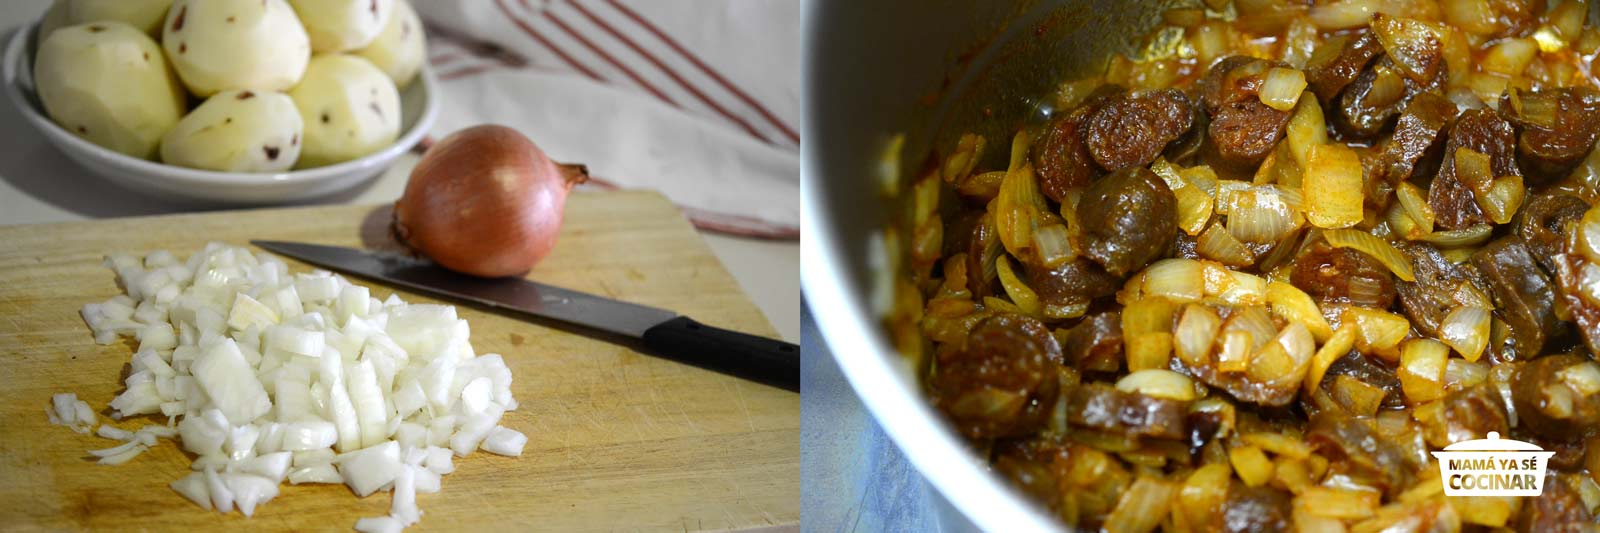 patatas-a-la-riojana3